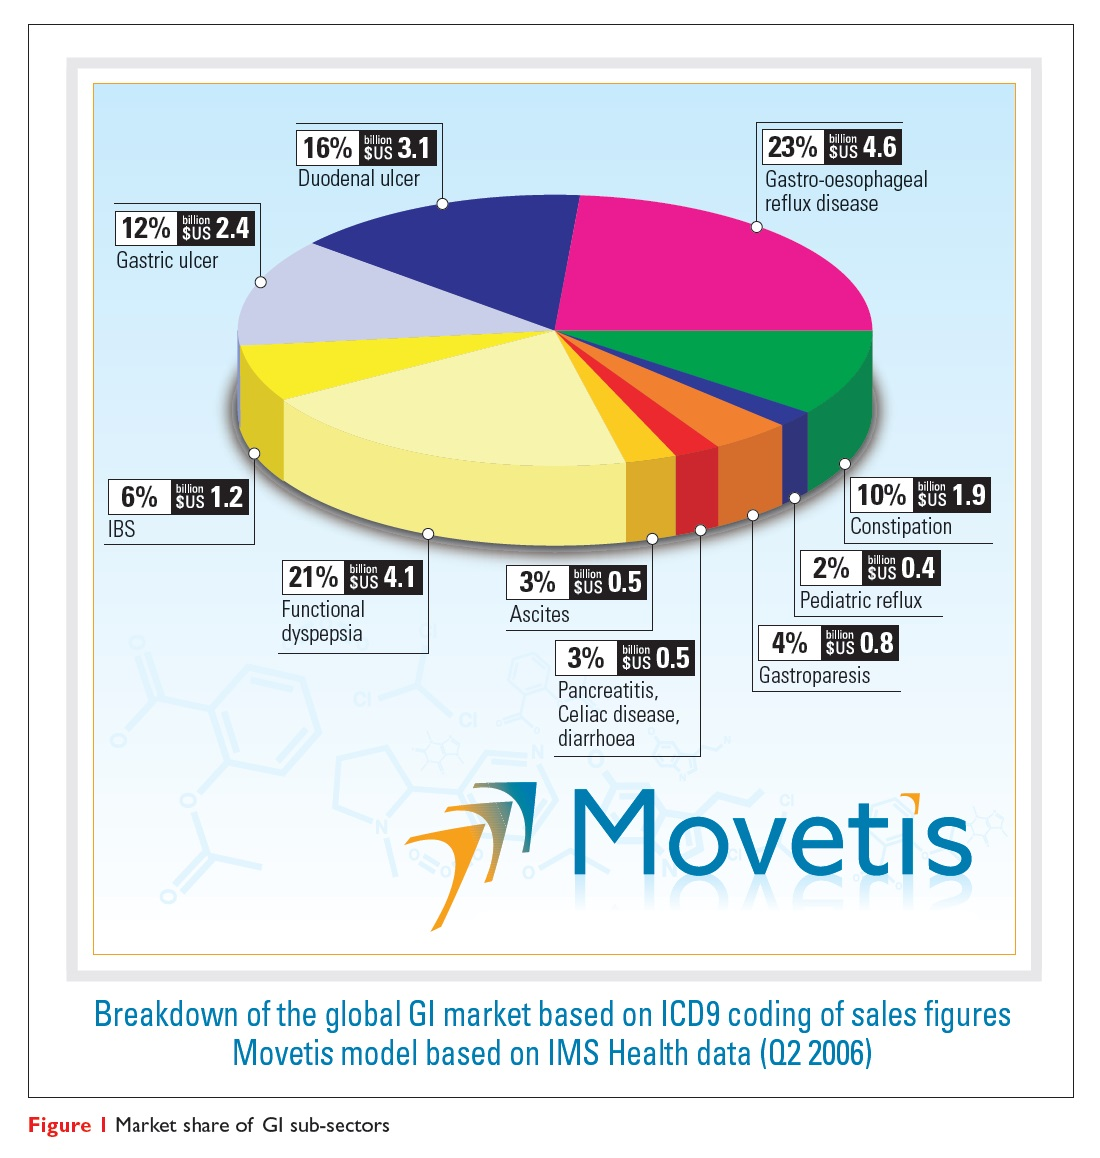 Figure 1 Market share of GI sub-sectors